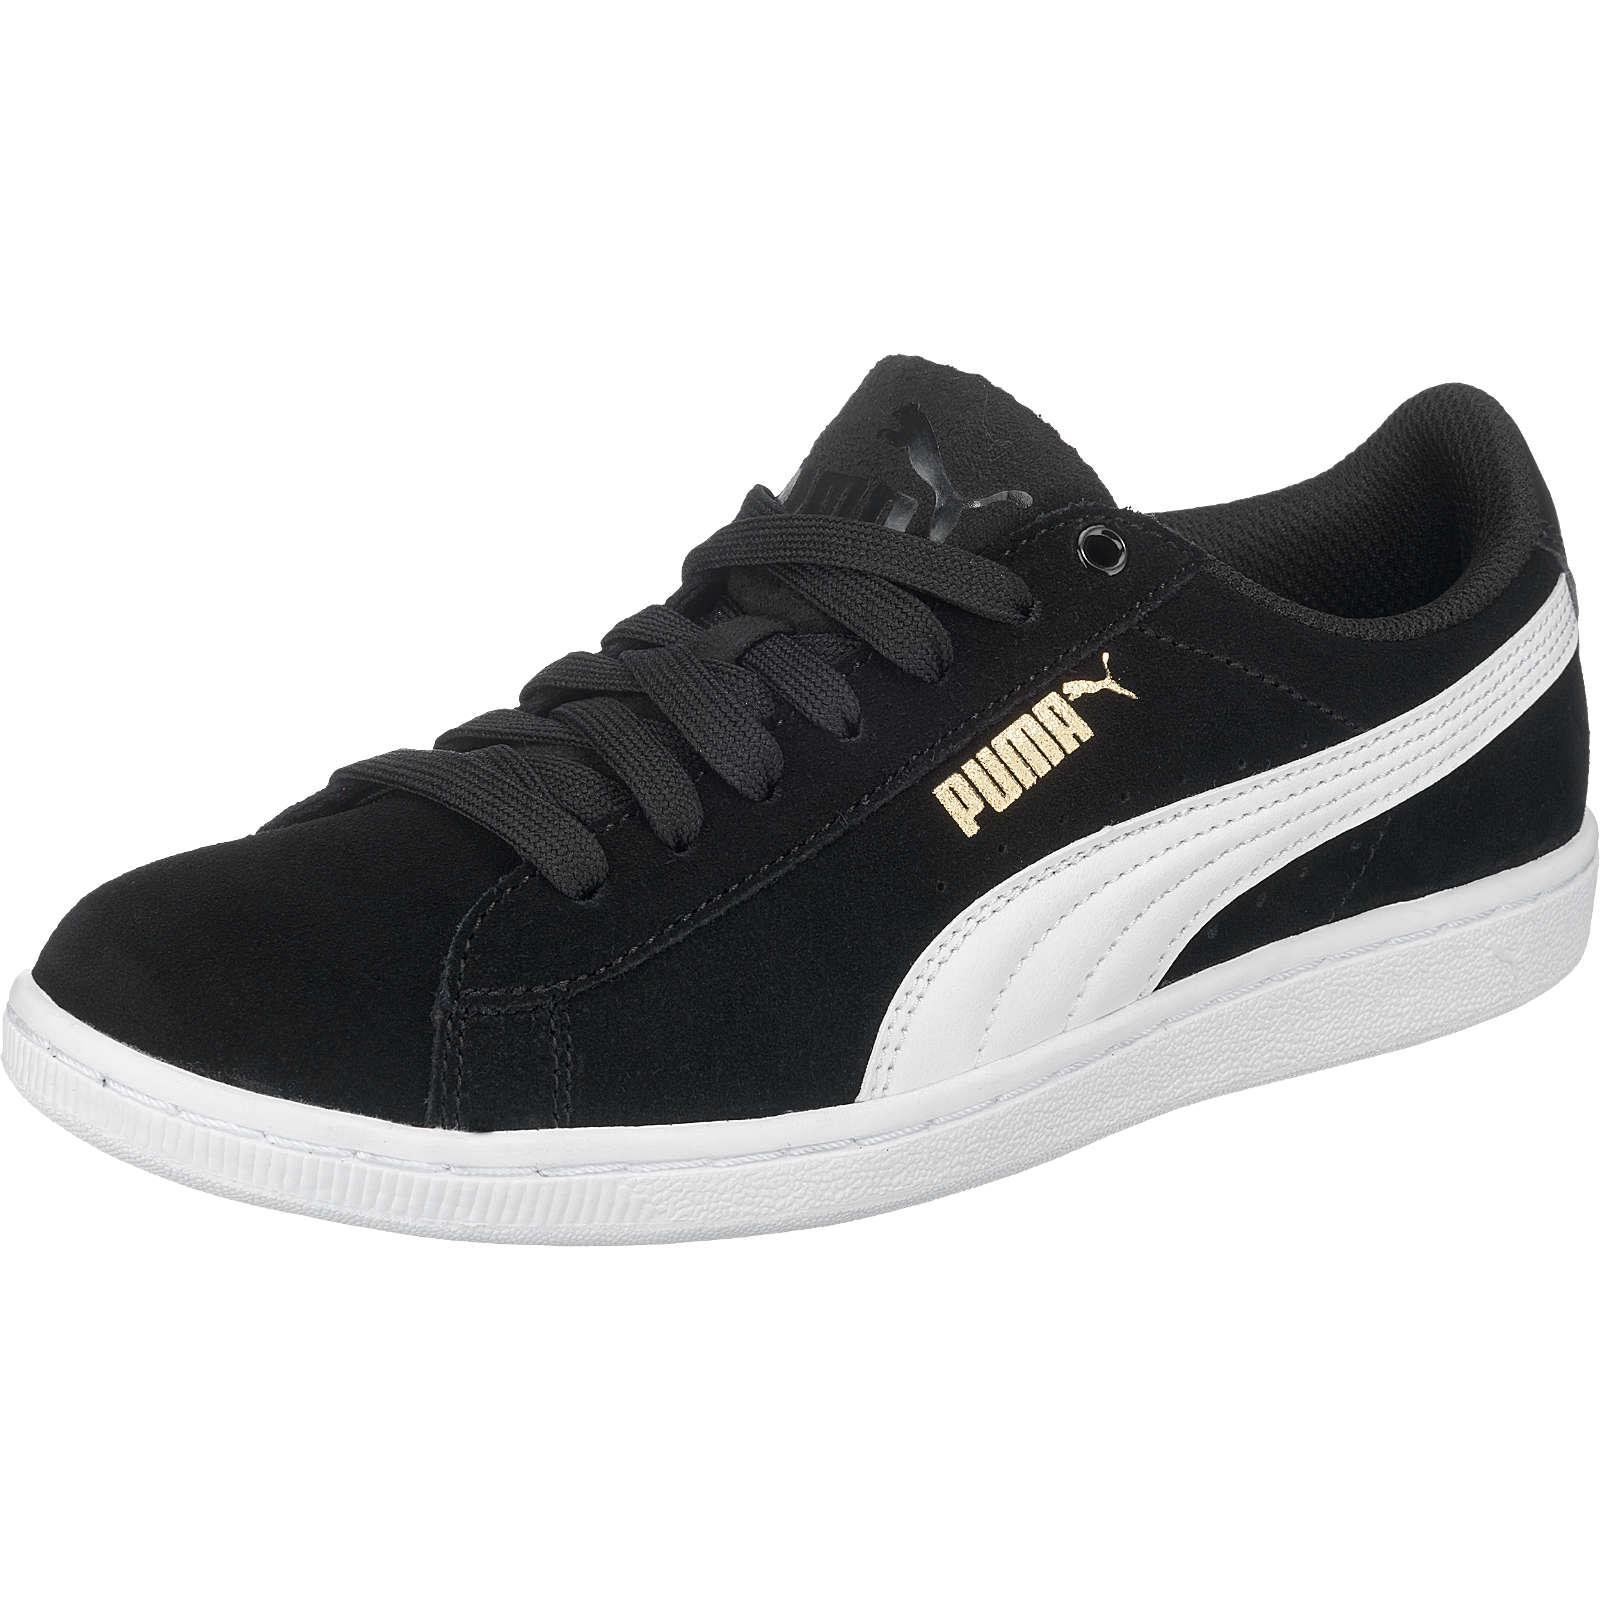 PUMA Vikky Sneakers Low schwarz/weiß Damen Gr. 42